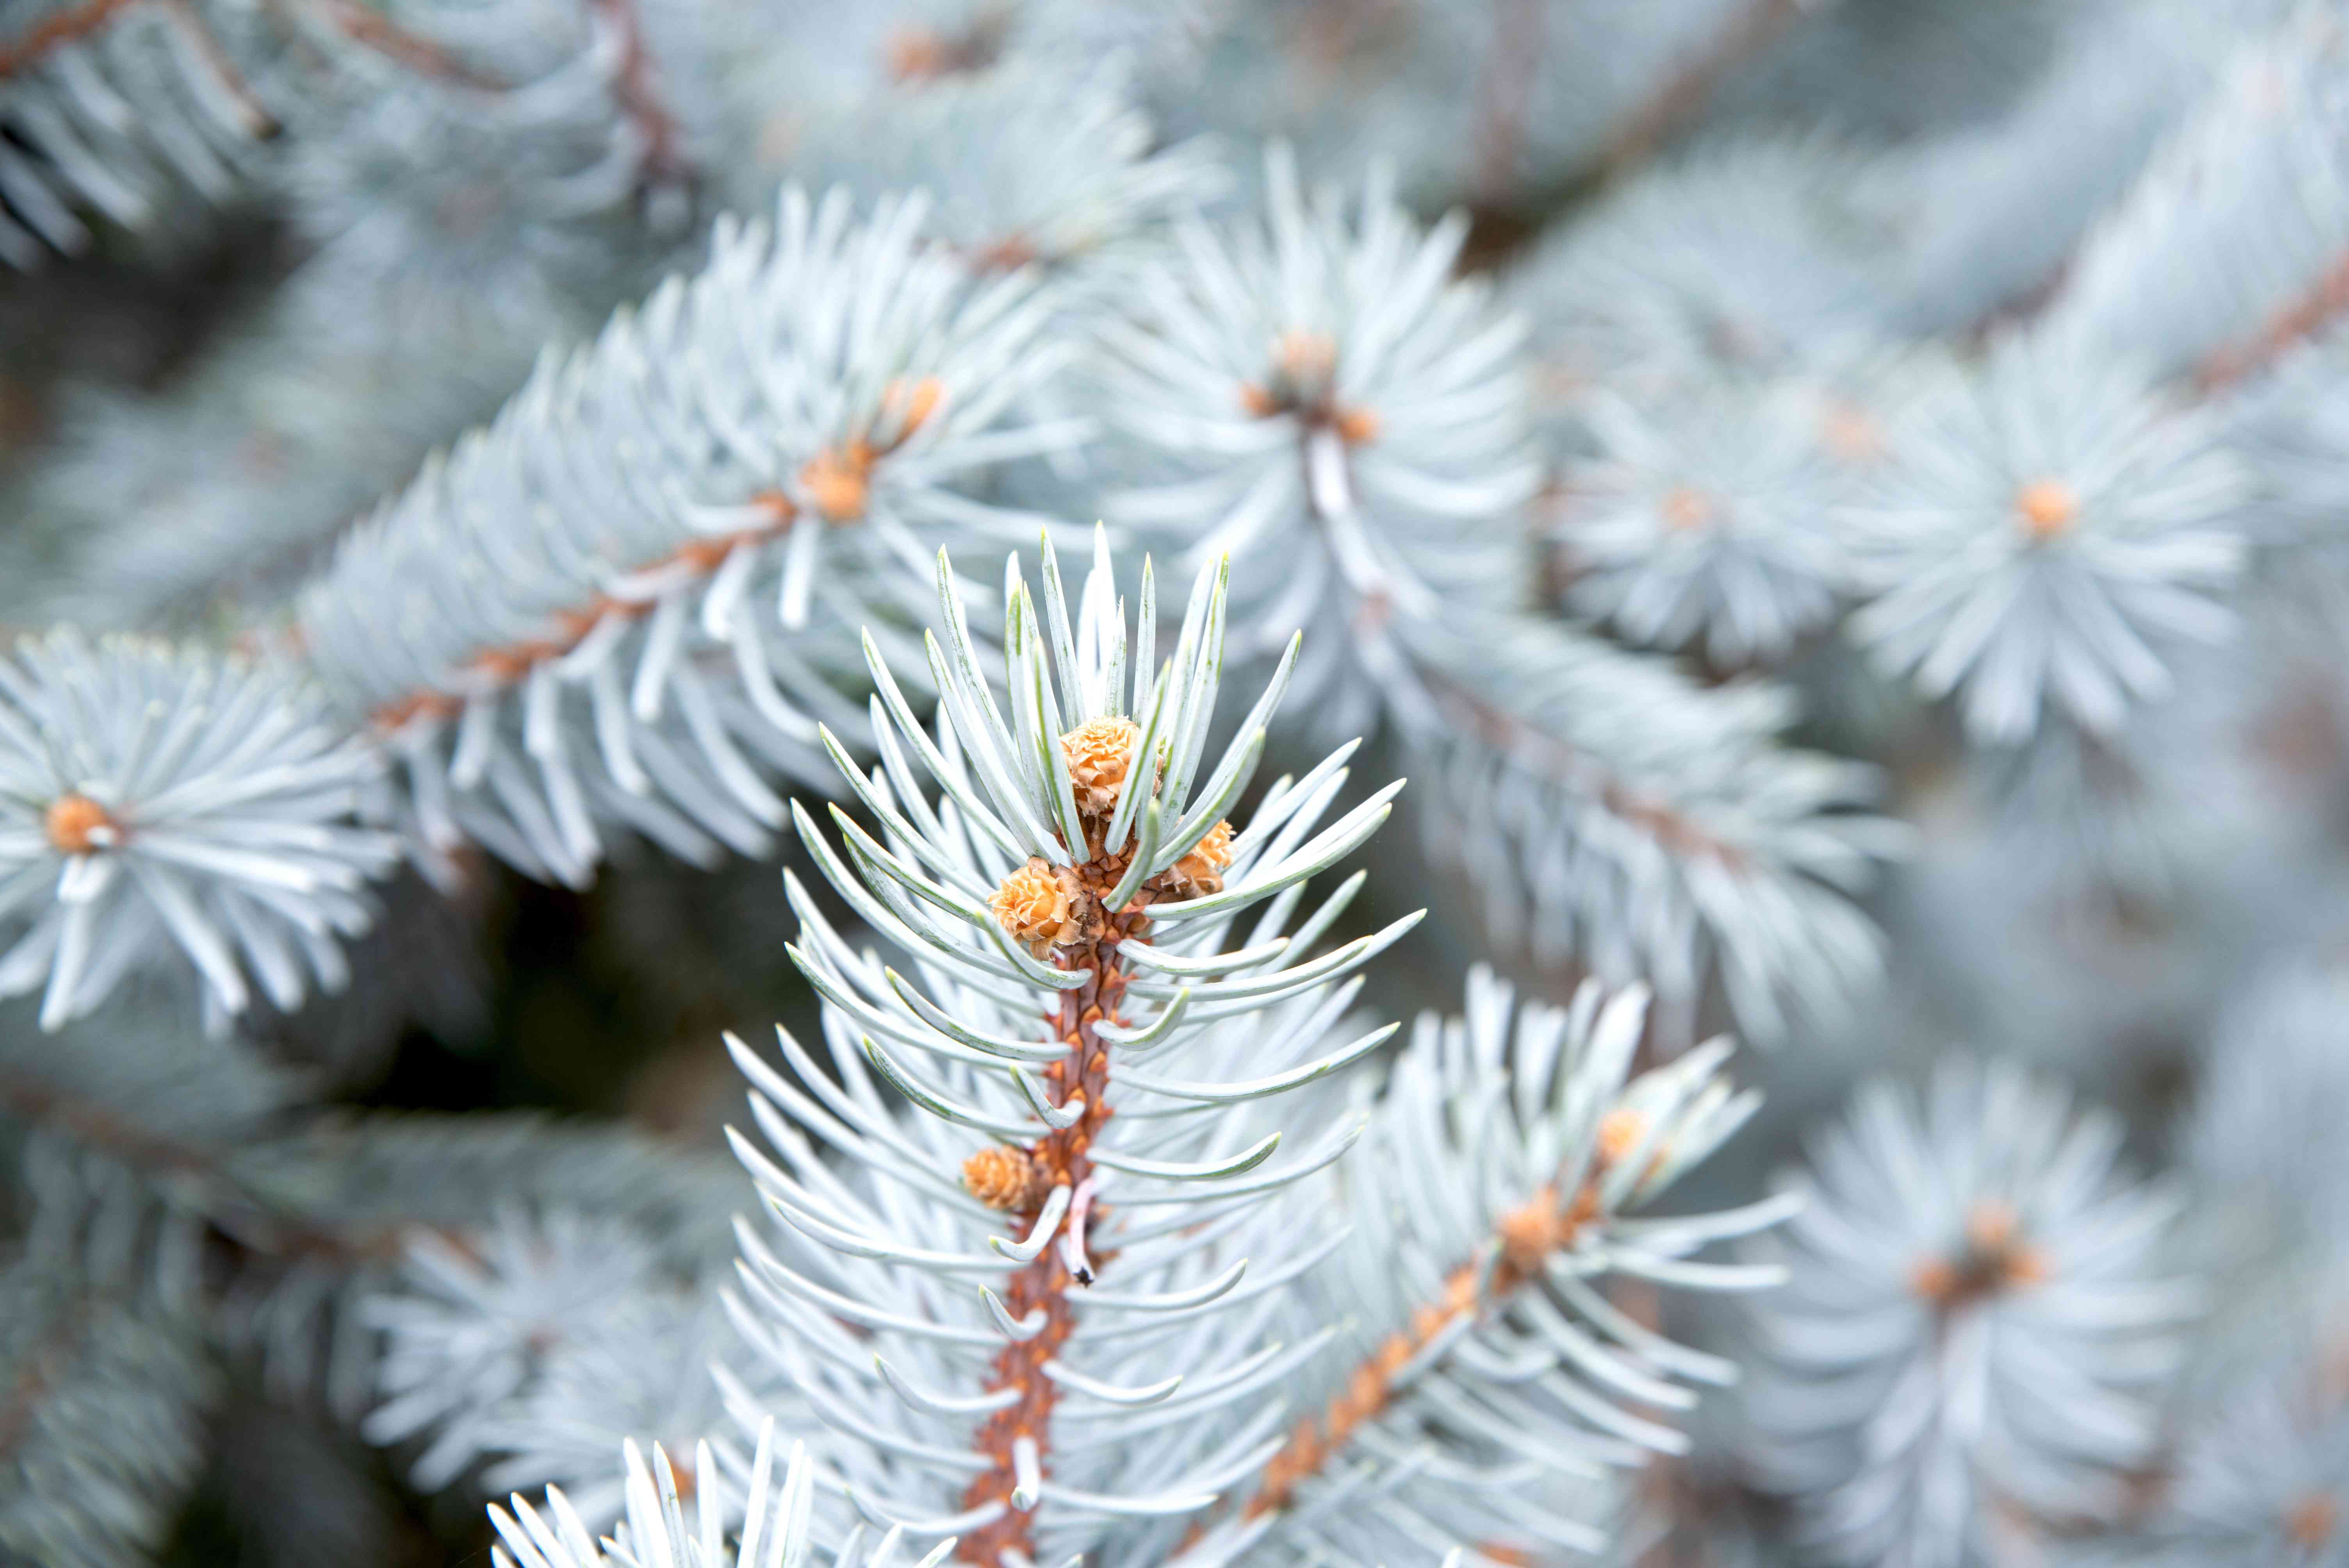 closeup of a Colorado blue spruce